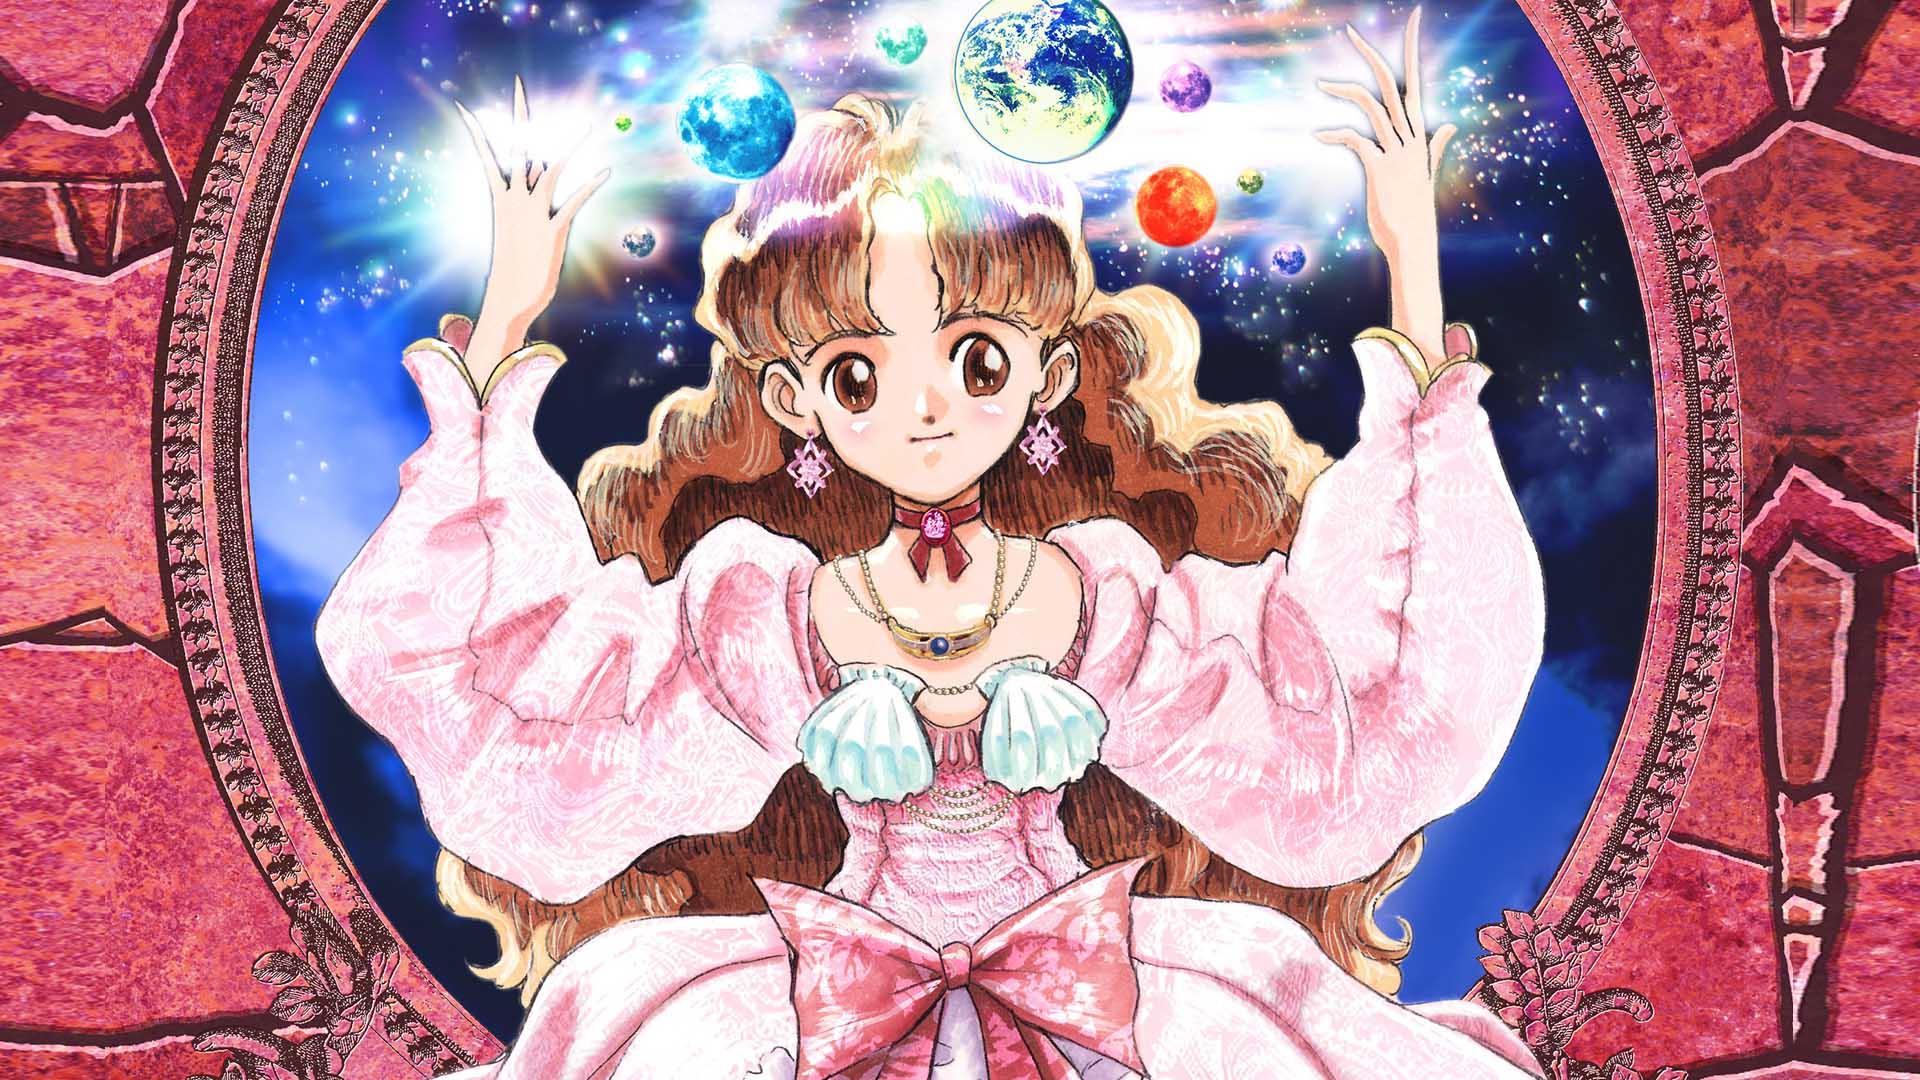 Steam card exchange showcase princess maker 2 refine malvernweather Choice Image